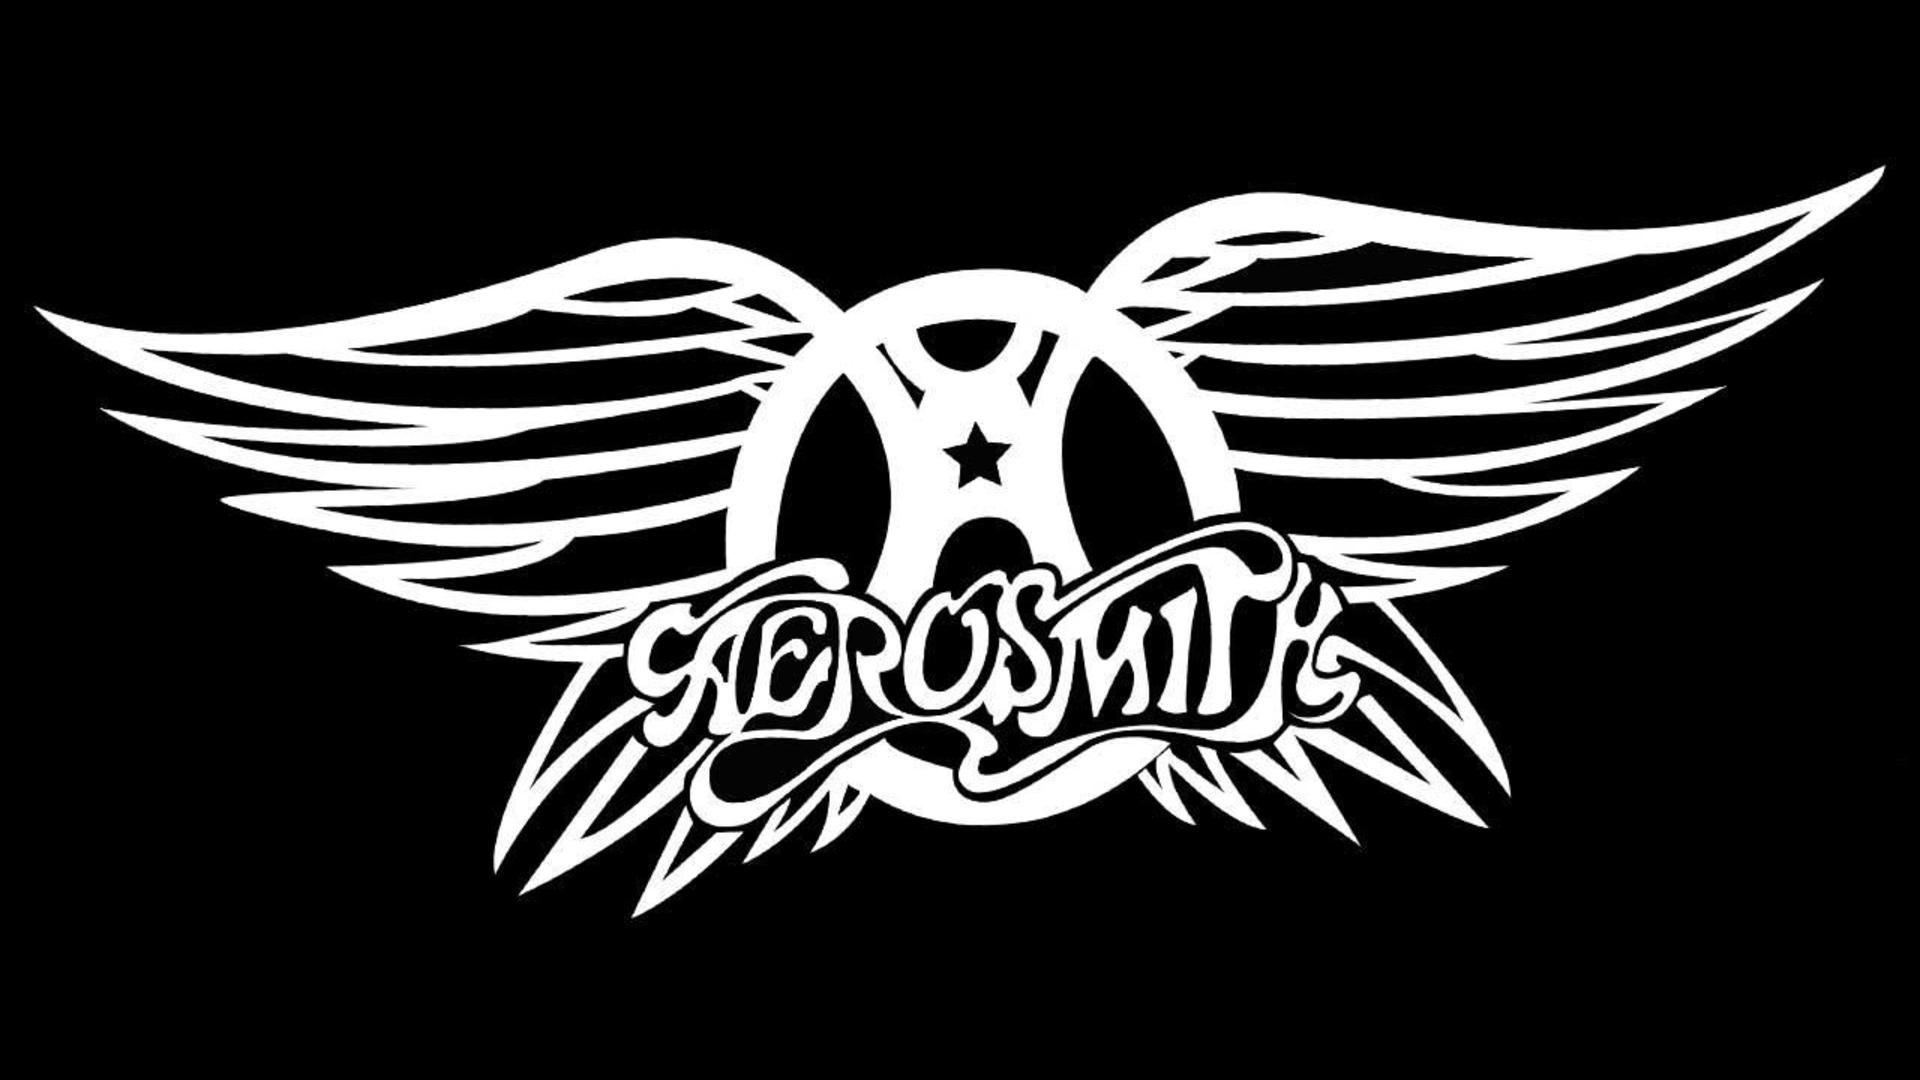 Aerosmith Logo Aerosmith Rock Band Logos Rock Bands